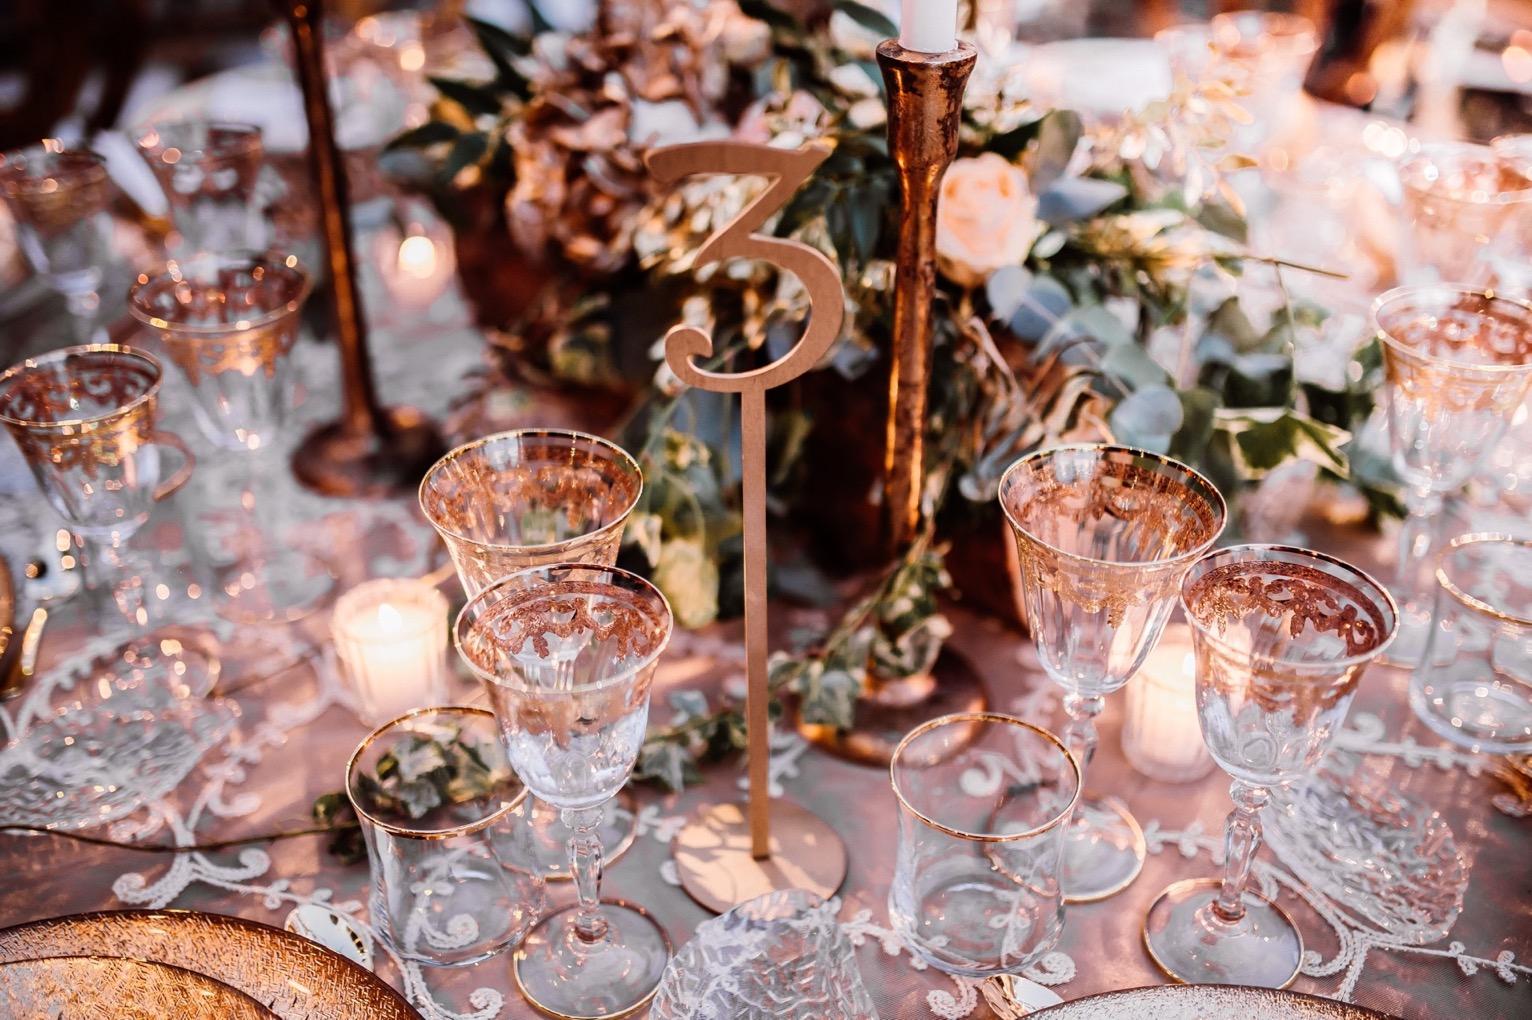 Si-Quiero-Wedding-Planner-By-Sira-Antequera-Bodas-Málaga-Marbella-Miami- L-A-11